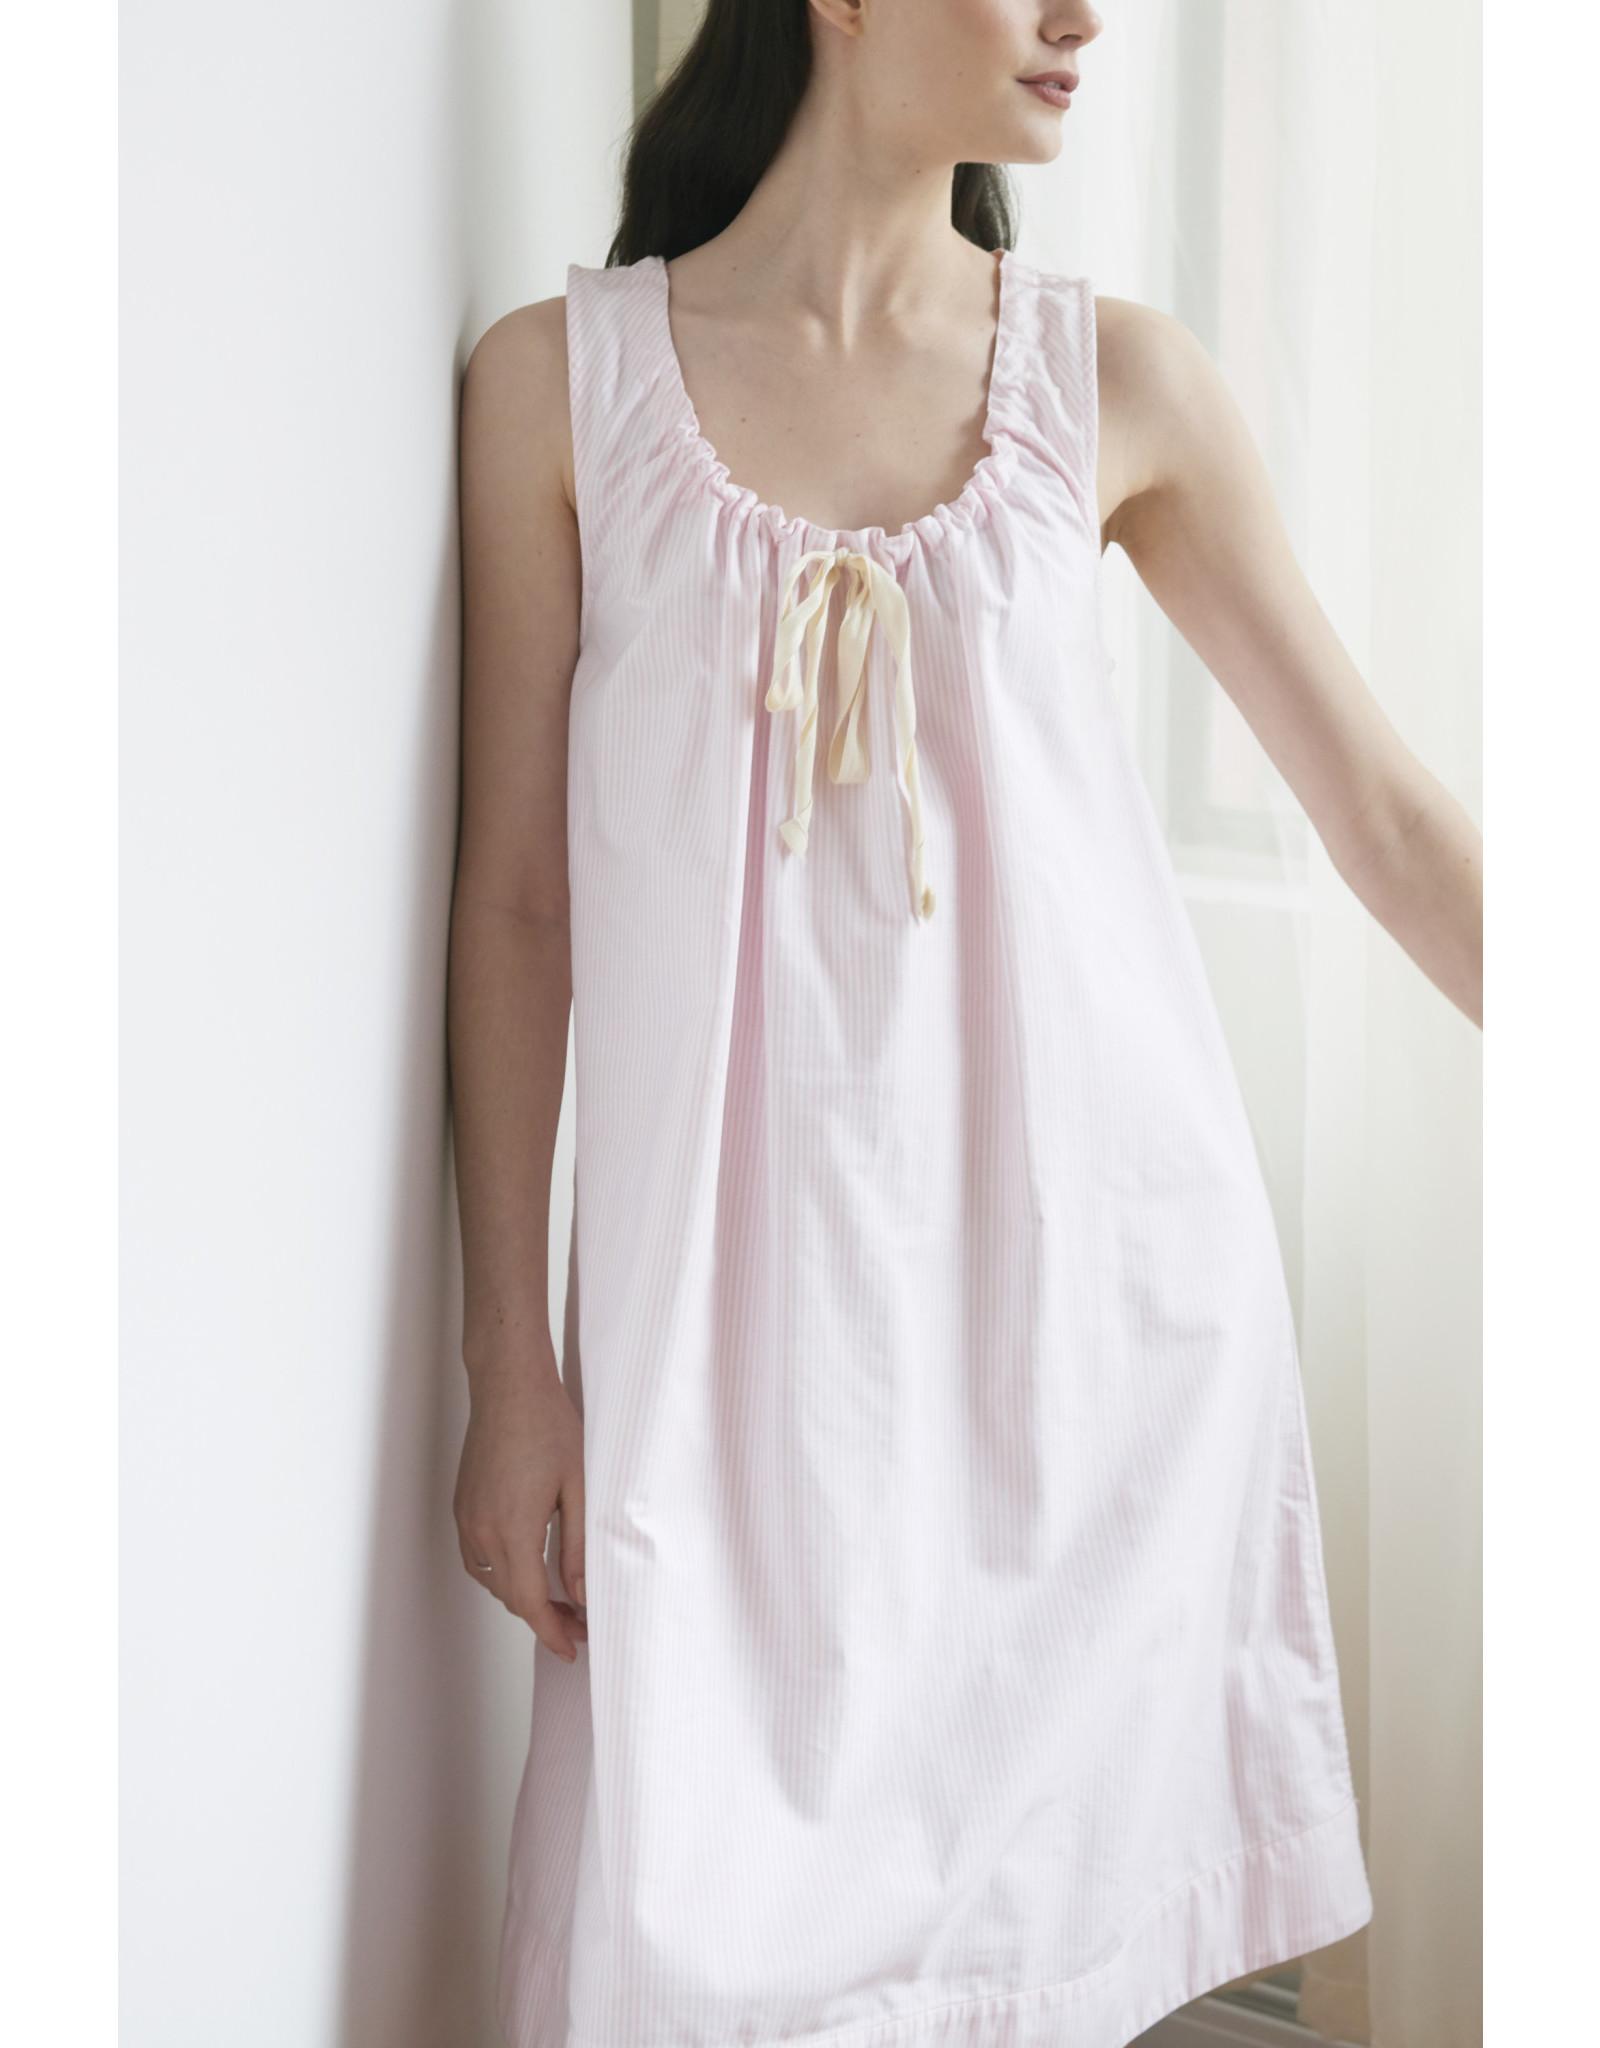 The Sleep Shirt Sleeveless Nighty 100